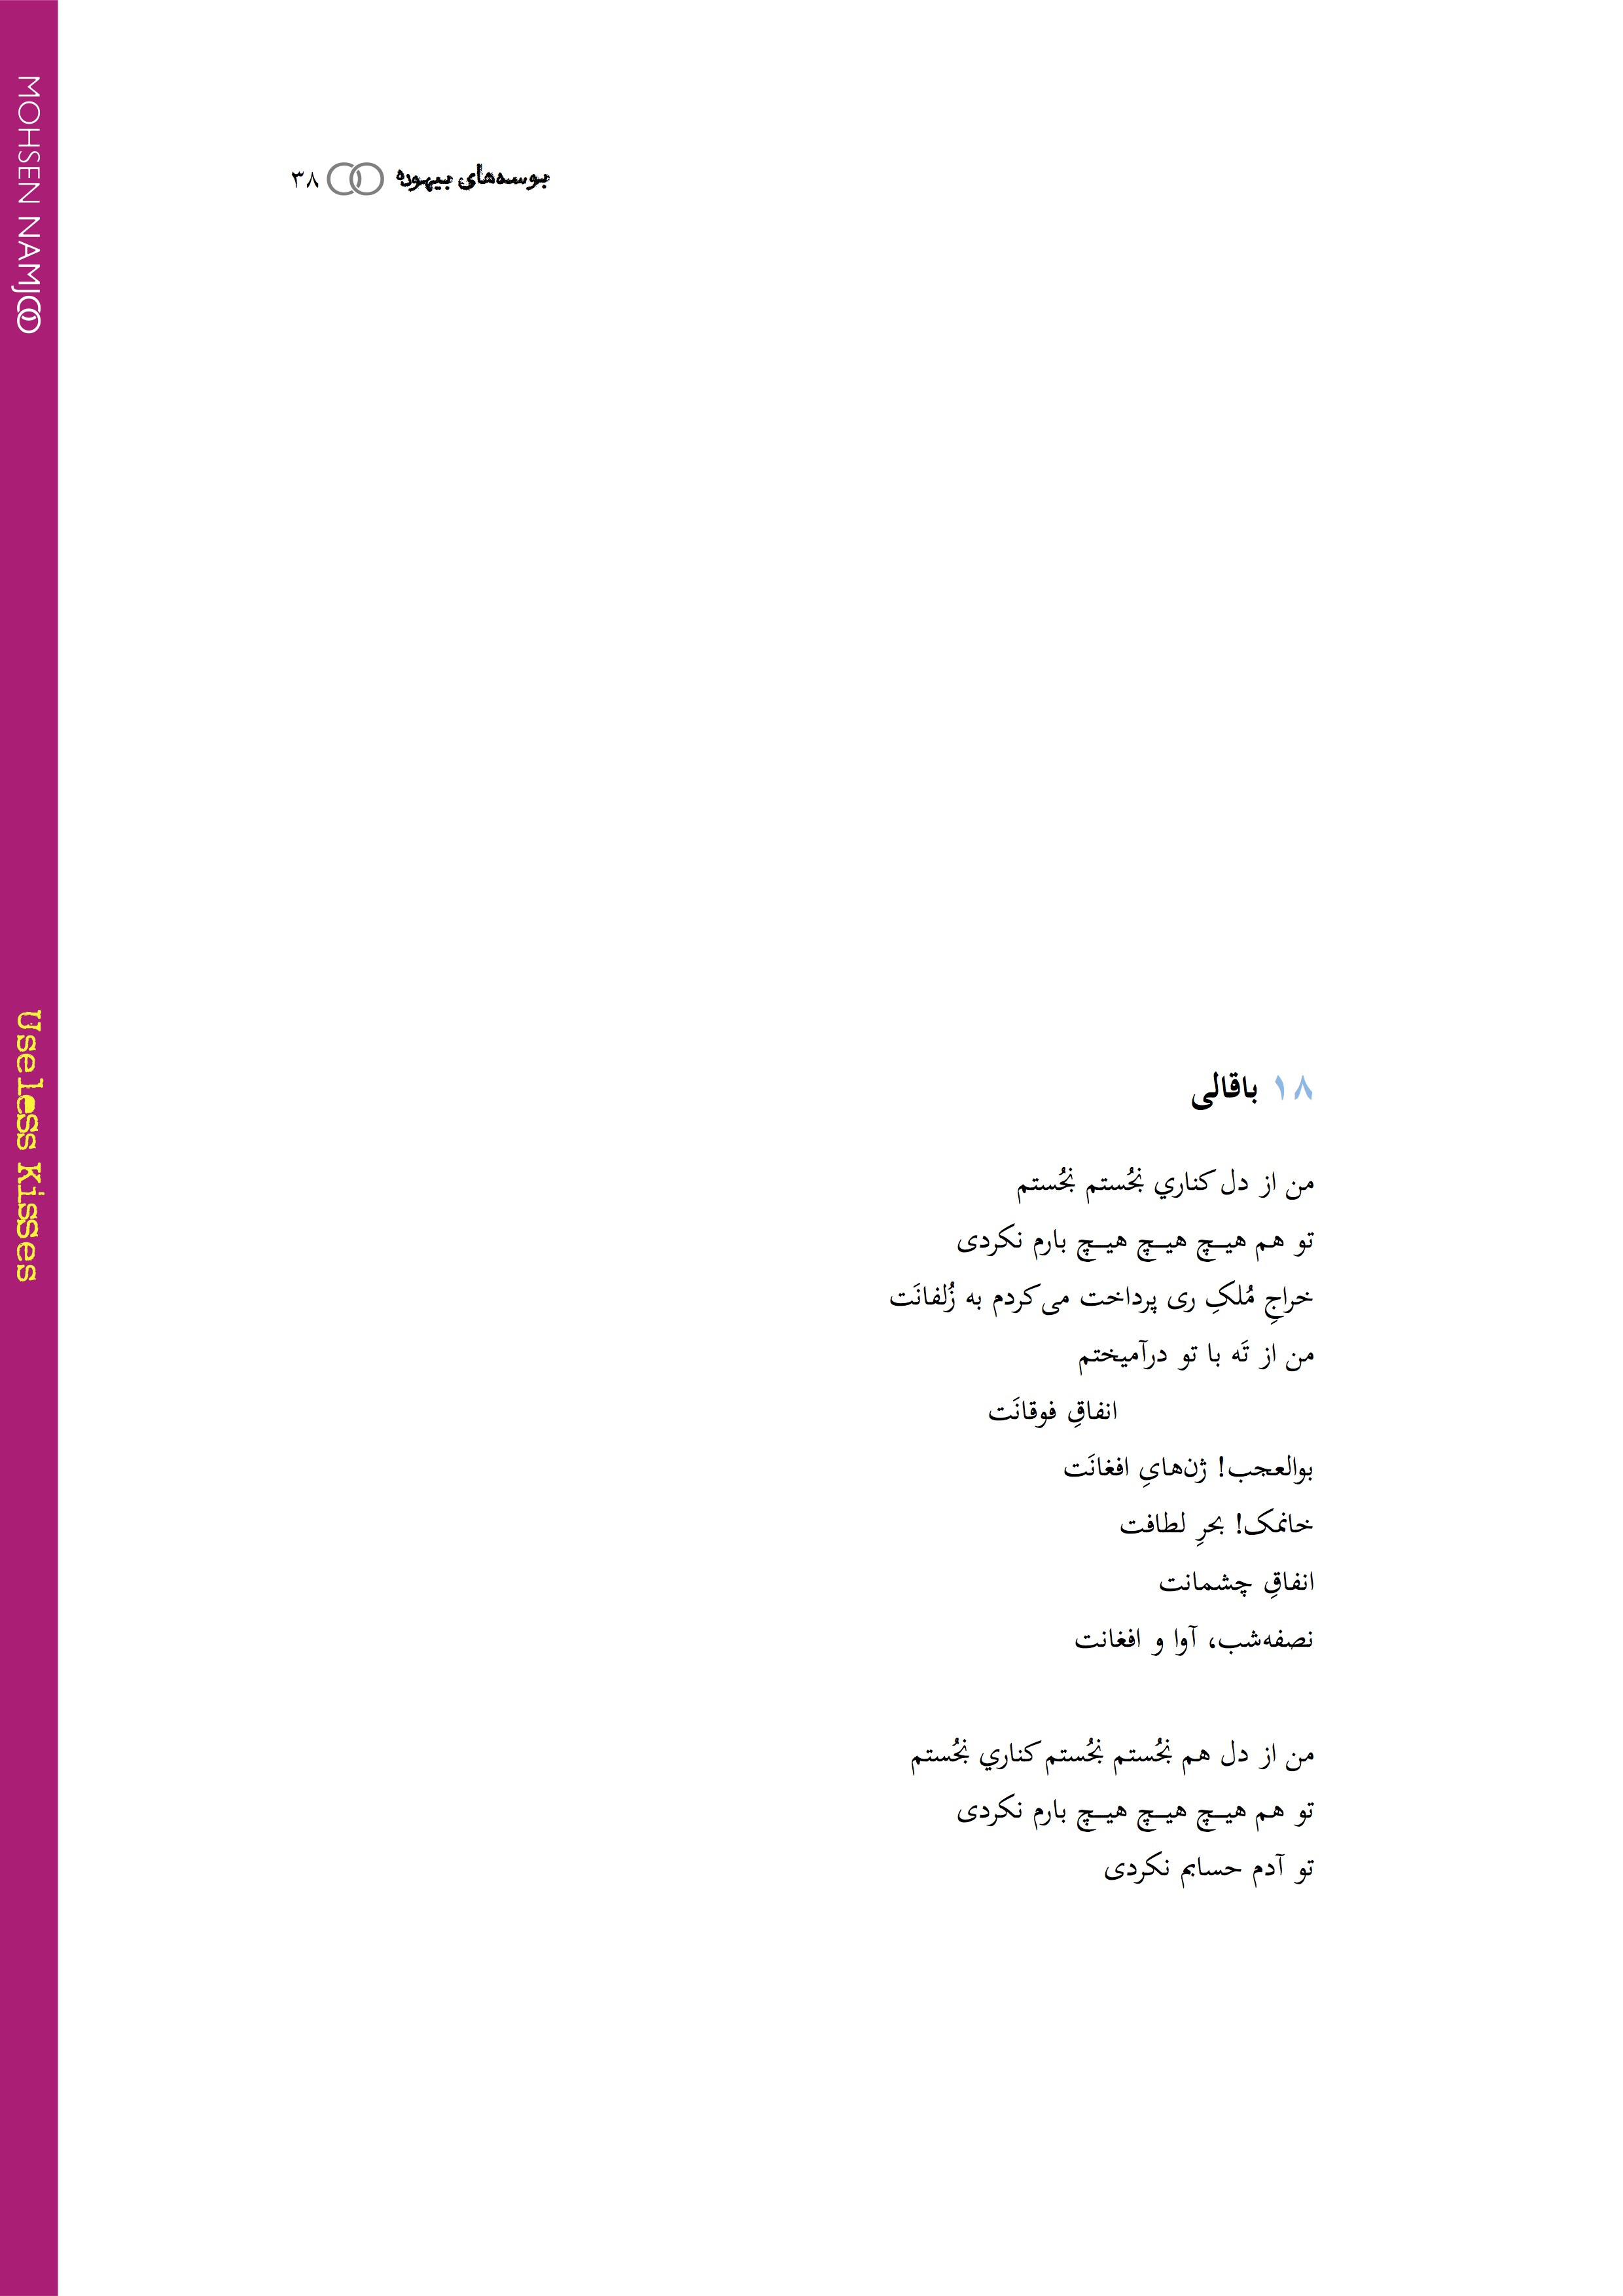 37Useless Kisses eBook (2nd Edition).jpg